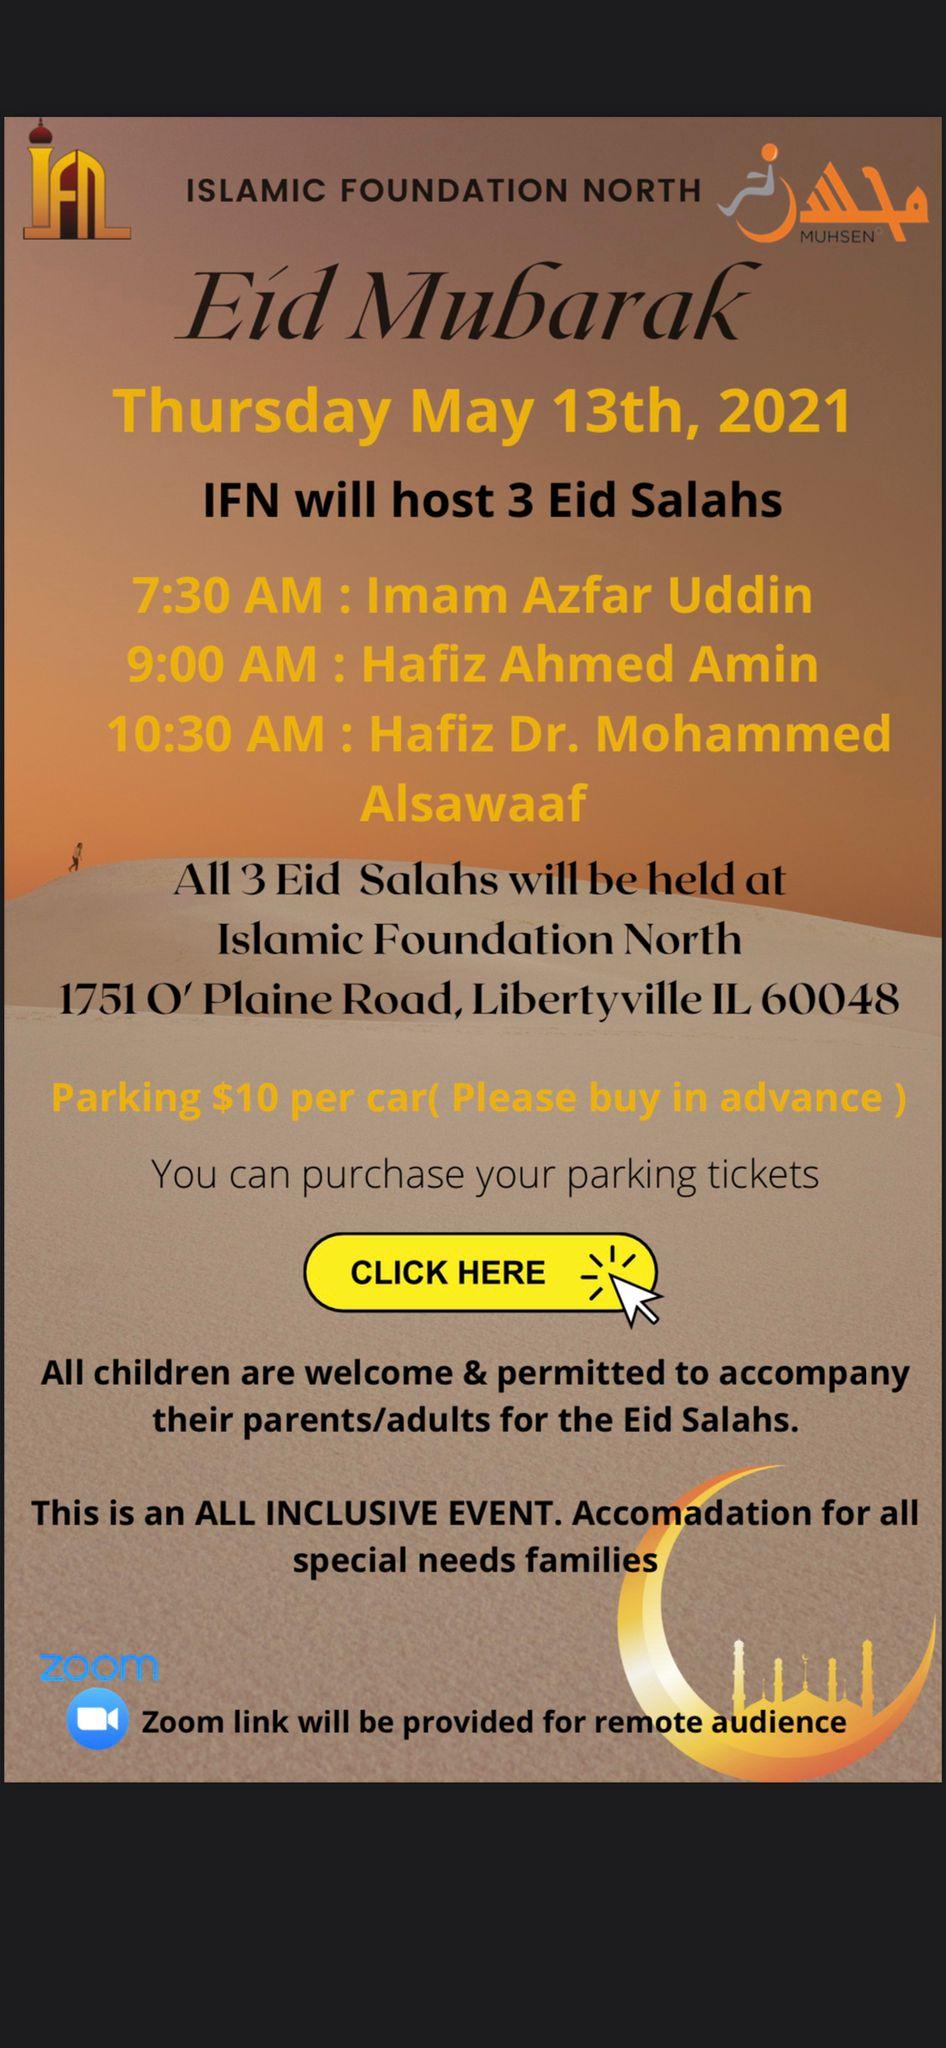 Islamic Foundation North Eid Salah Flyer